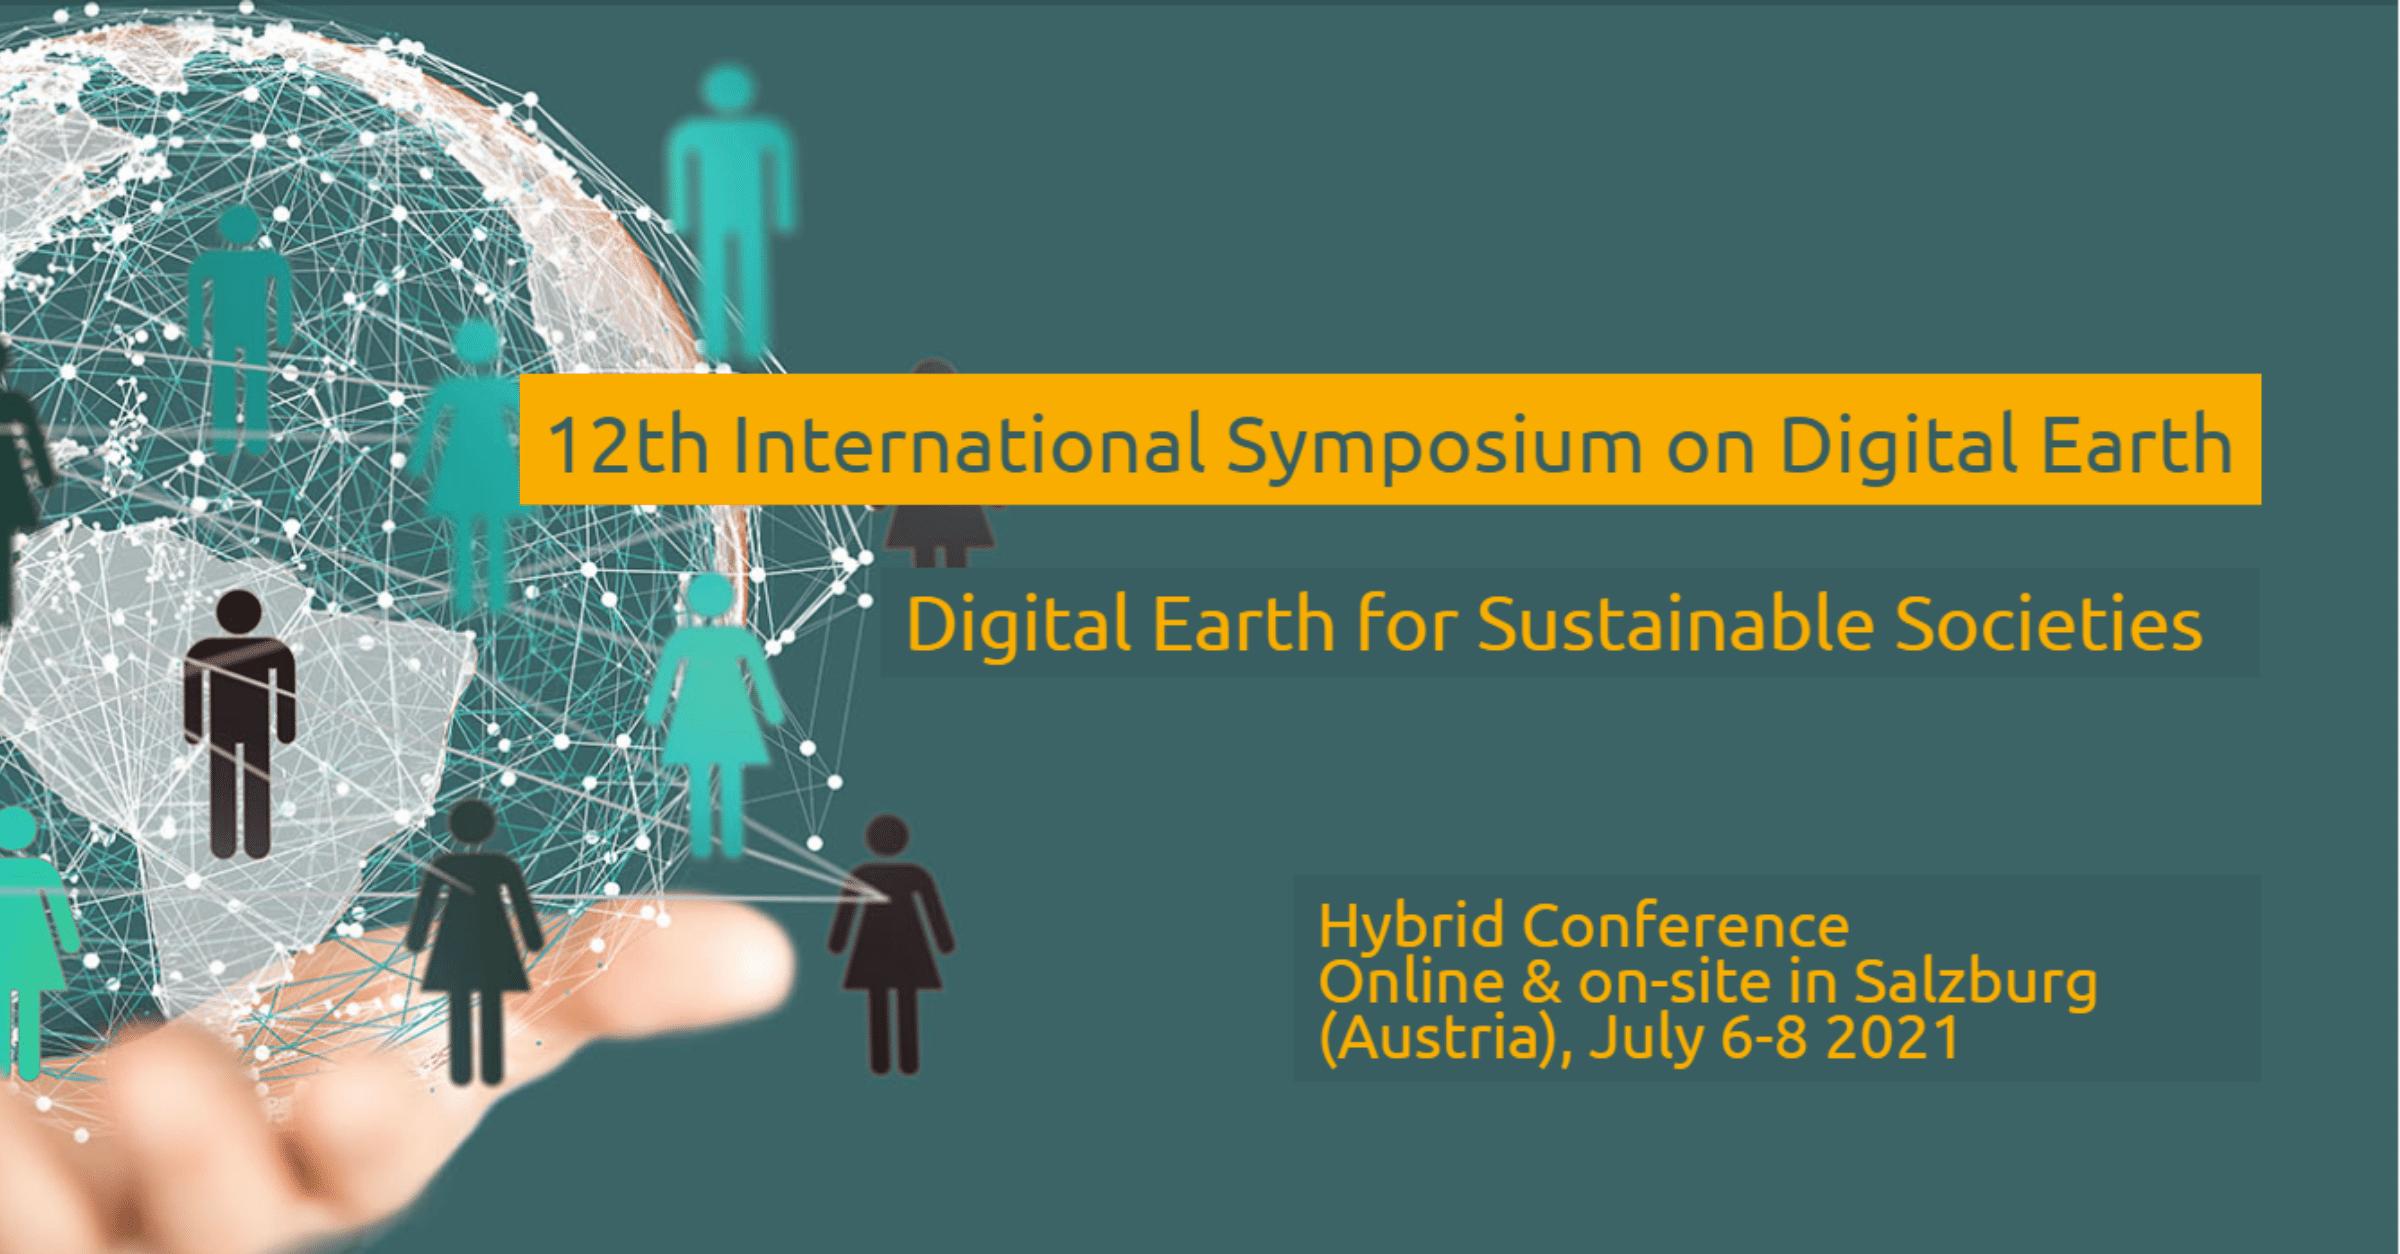 International Symposium on Digital Earth